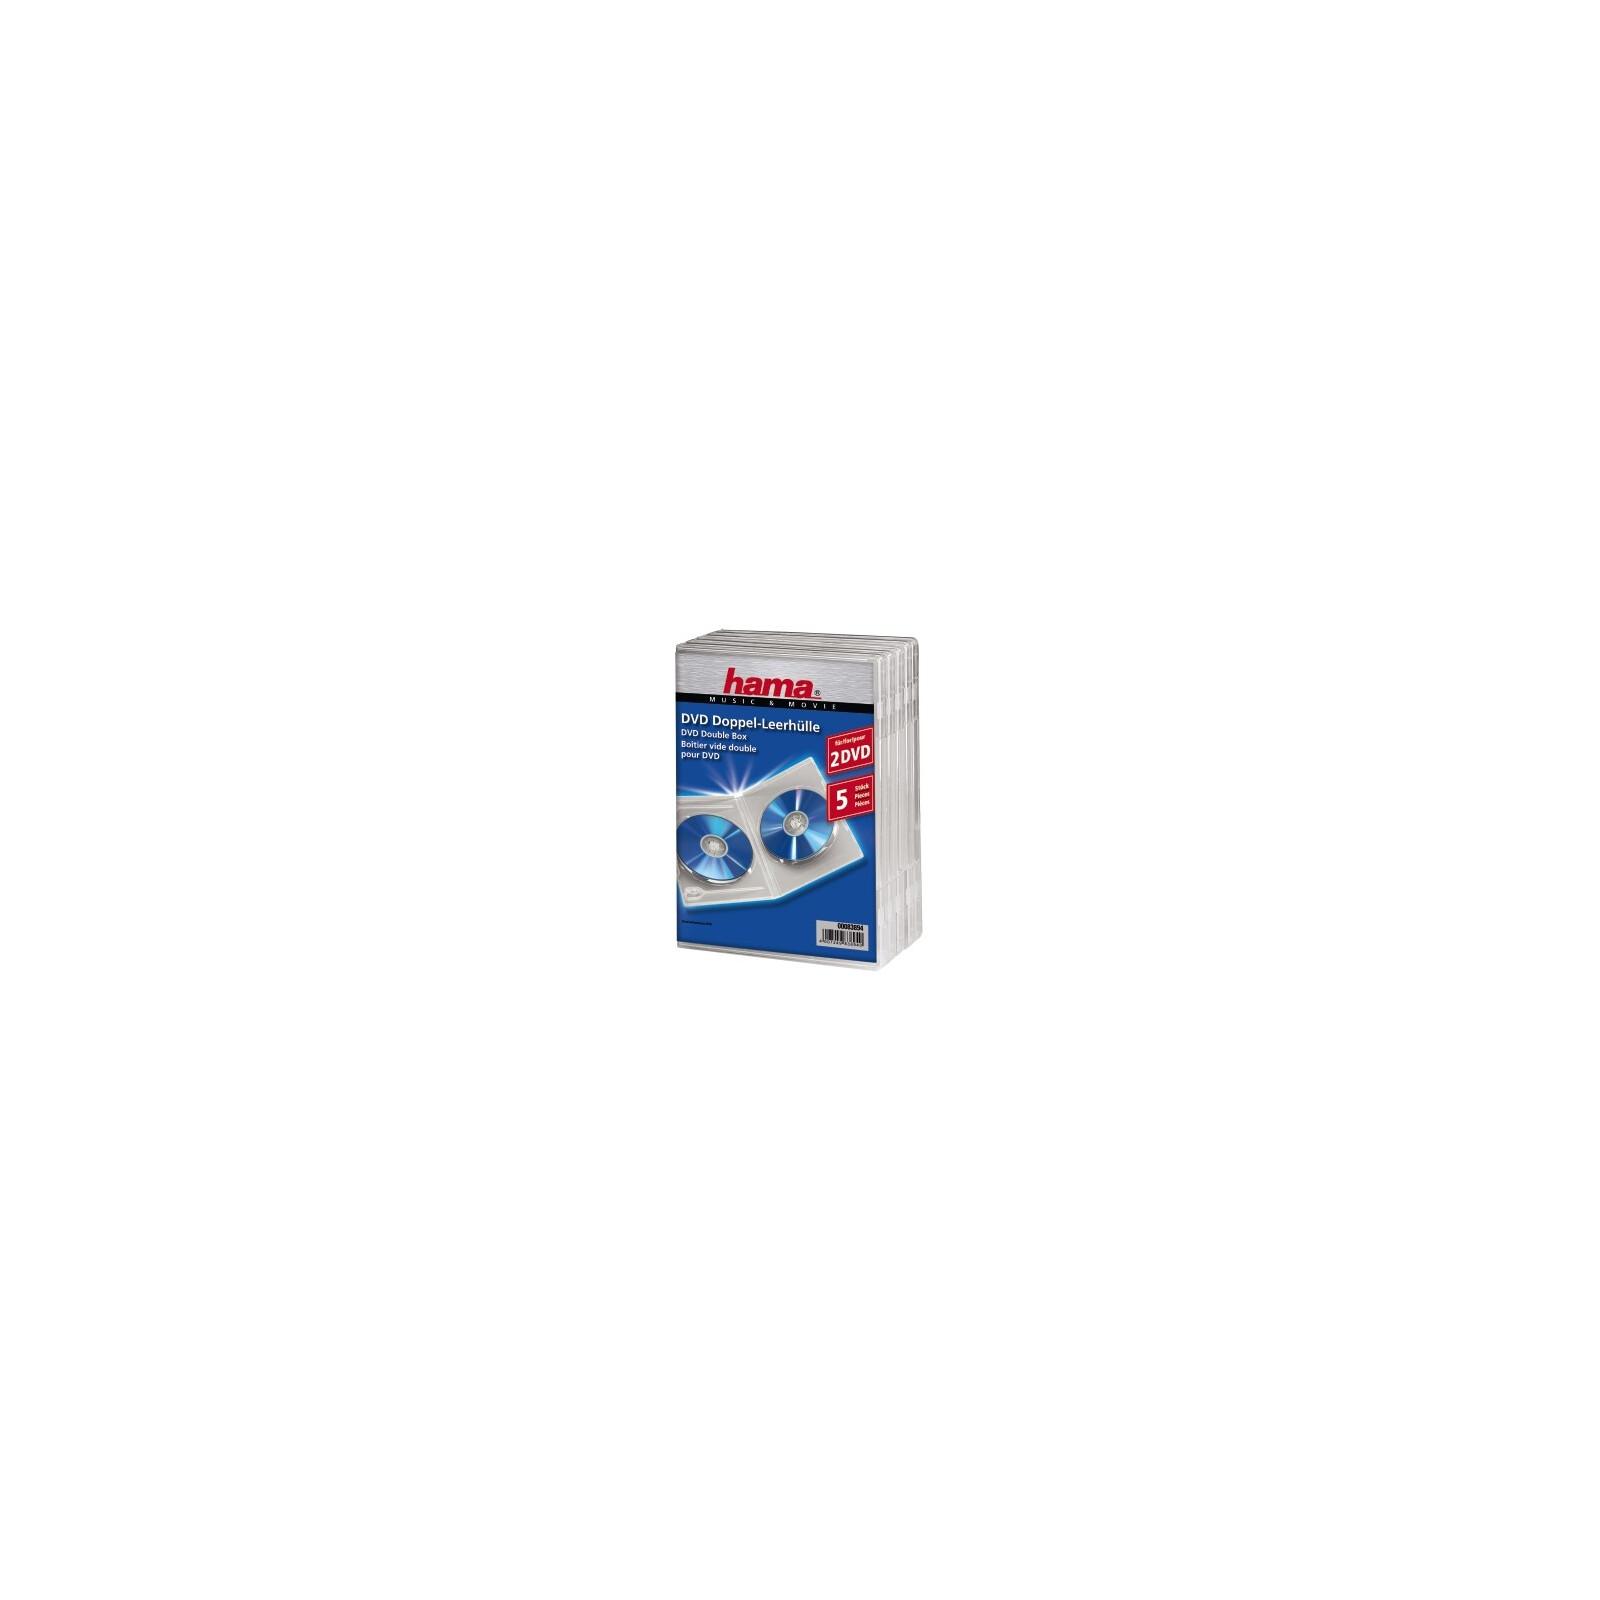 Hama 83894 DVD-Doppelleerhülle Standard 5er-Pack Transparent